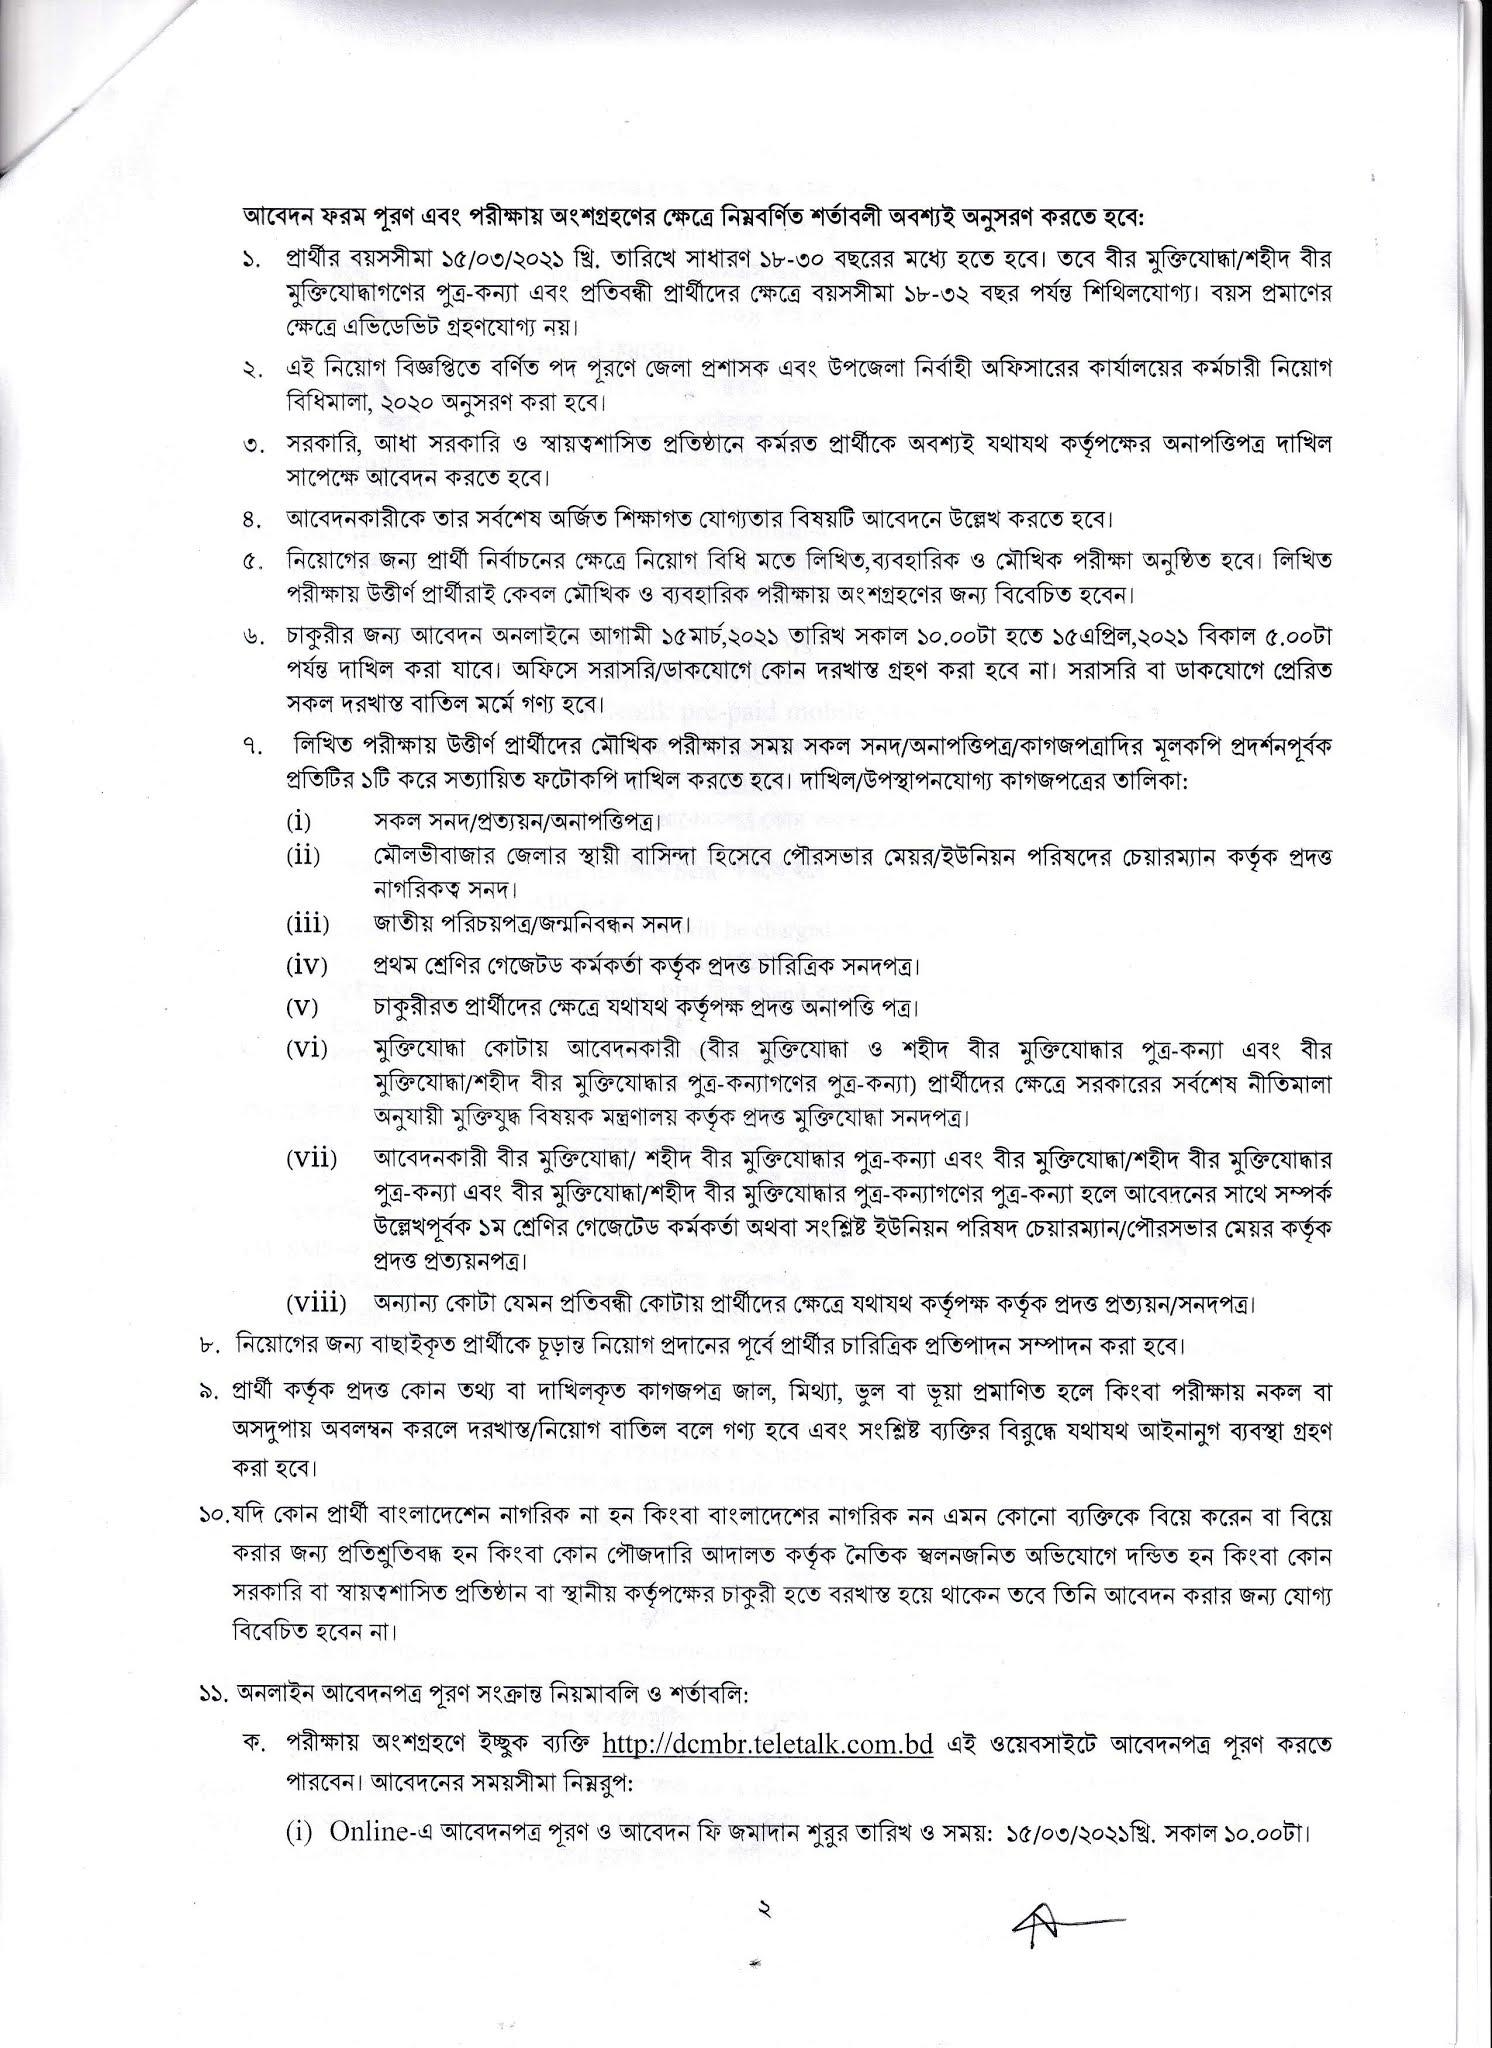 DC Office Moulibazar Job Circular 2021